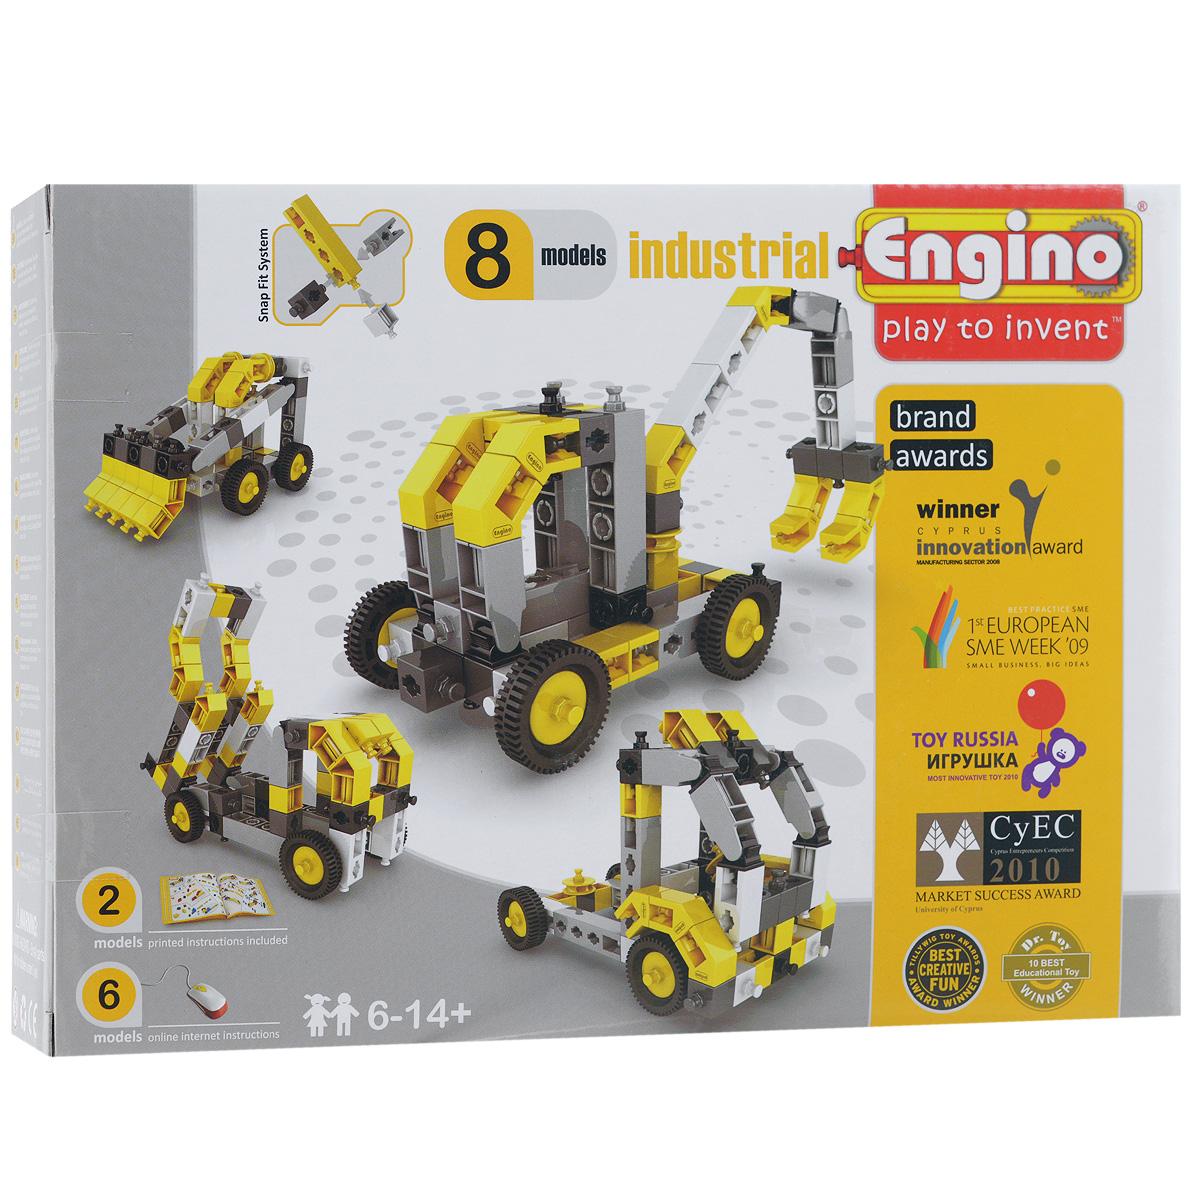 Engino Конструктор Industrial 8 models overlord маруяма куганэ мп3 аудиокнига том 8 скачать